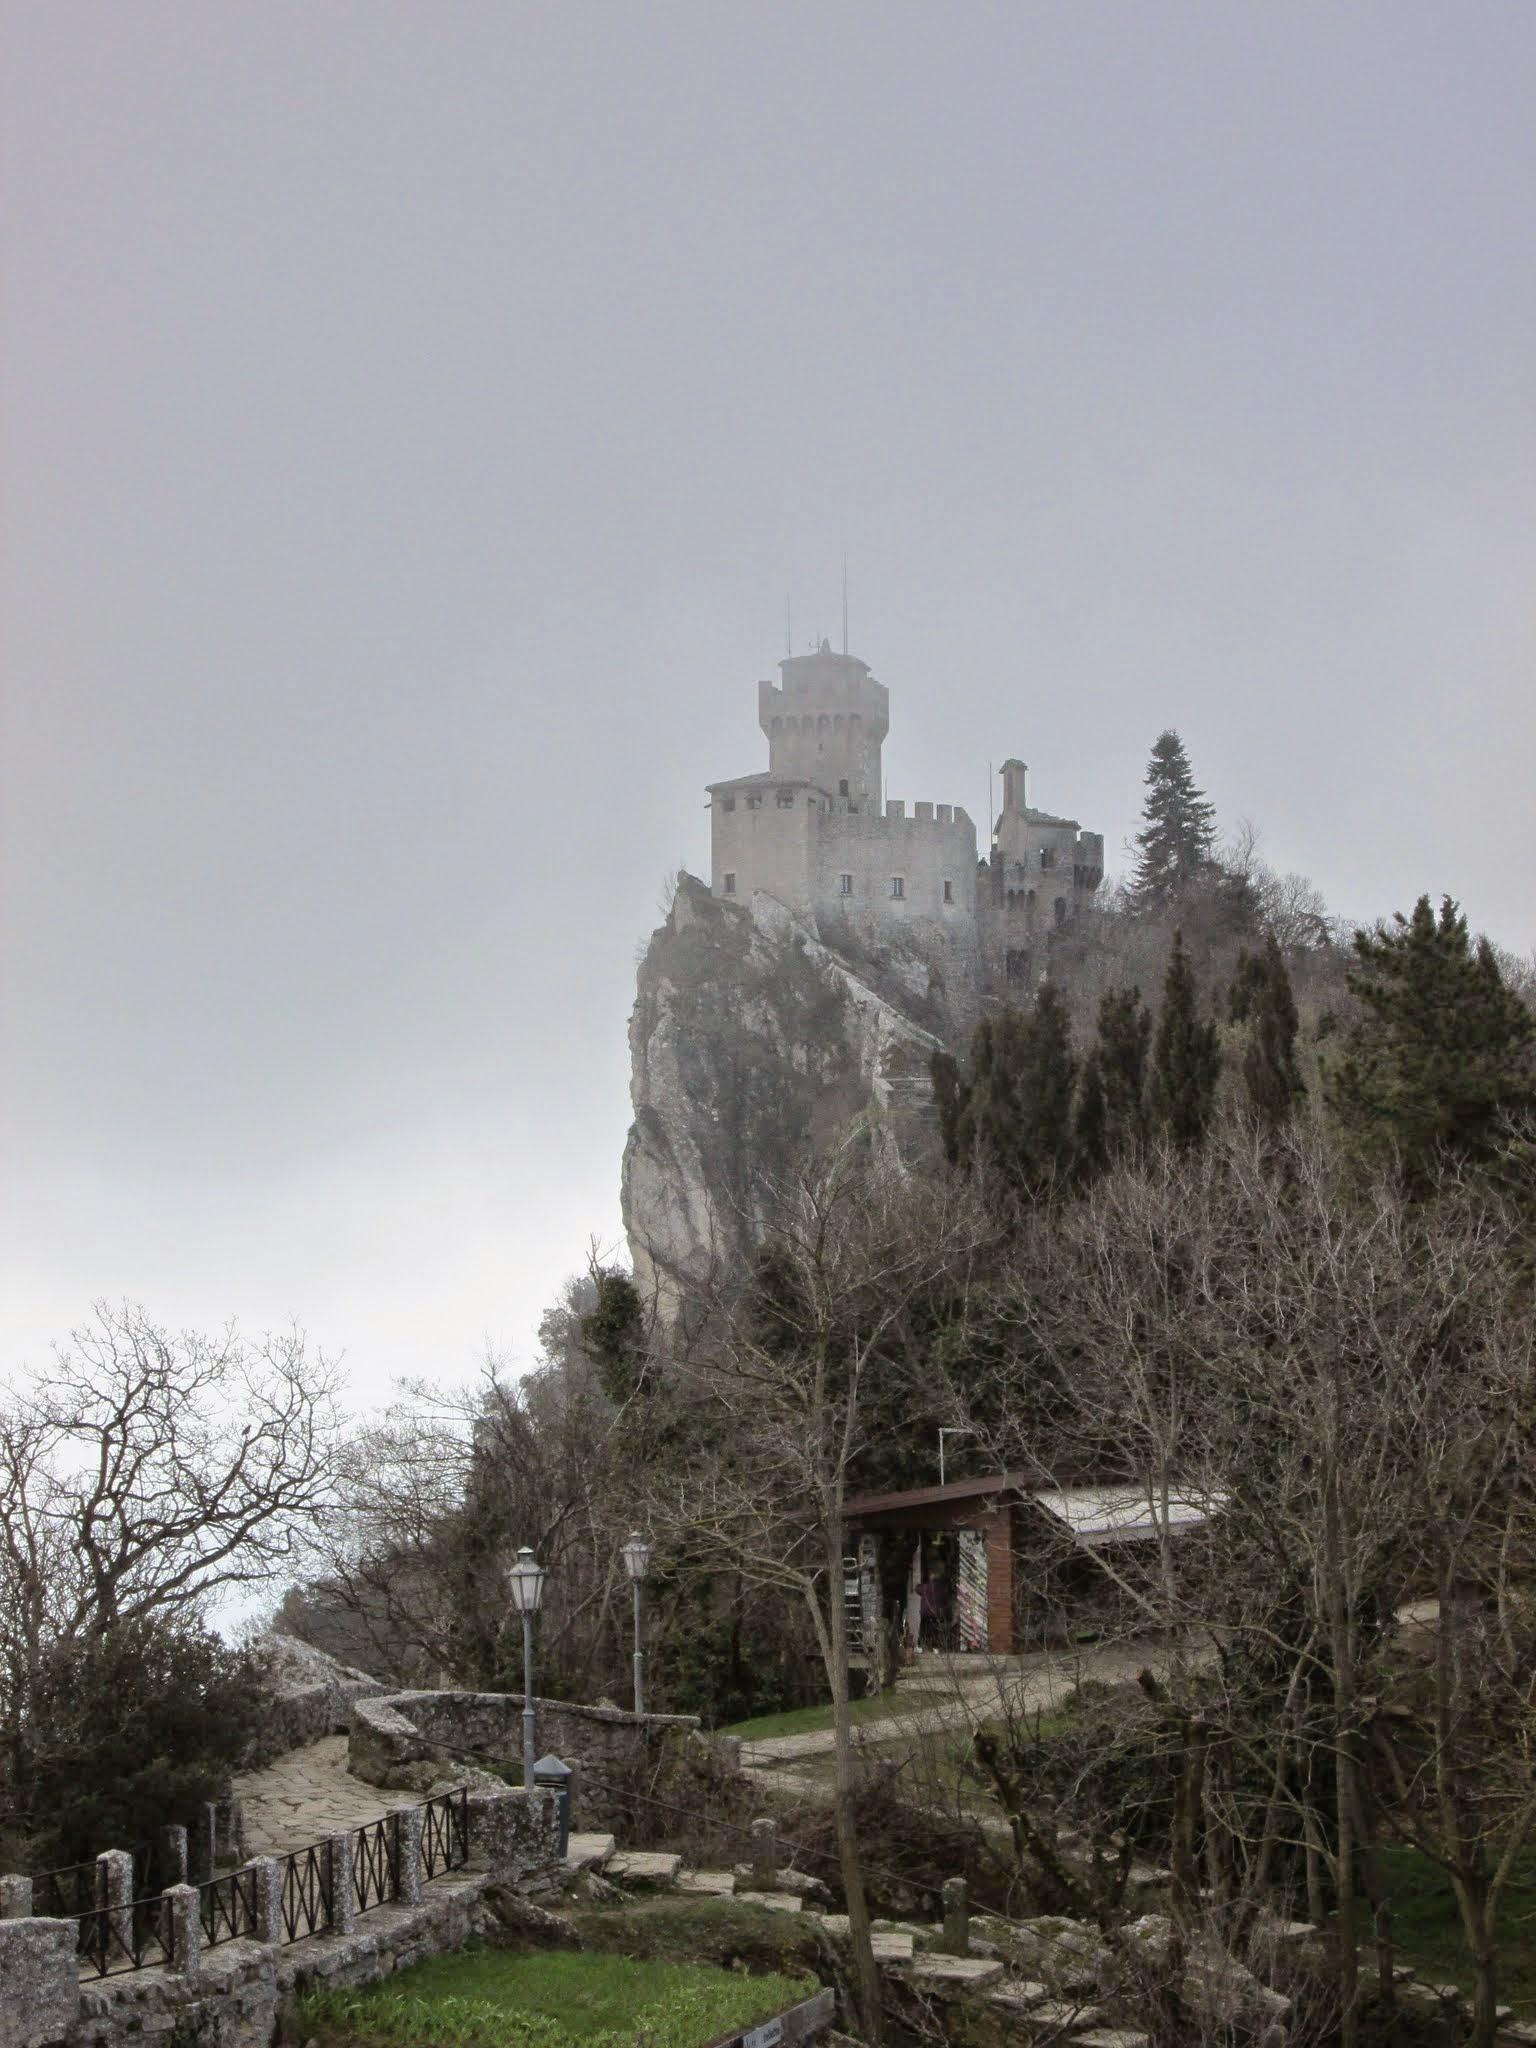 http://bemzawiercie.pl/wp-content/uploads/2017/04/San-Marino-154.jpg